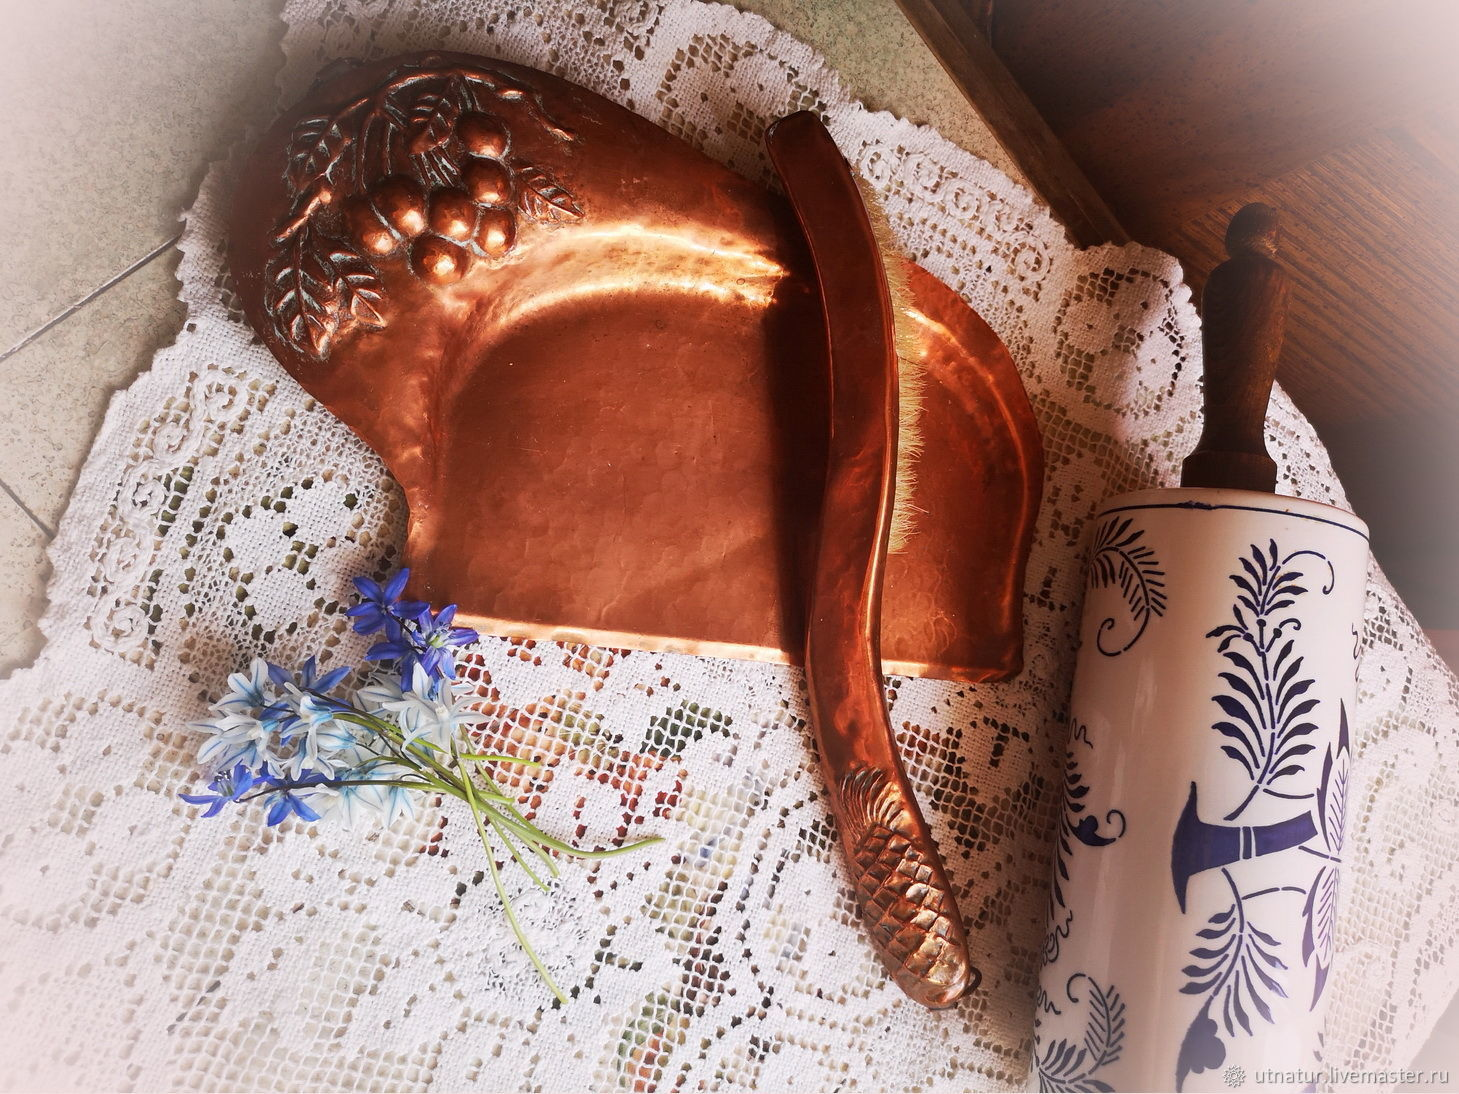 Винтаж: Медный аксессуар 1930-х гг для уборки стола, Винтажная кухонная утварь, Стокгольм, Фото №1